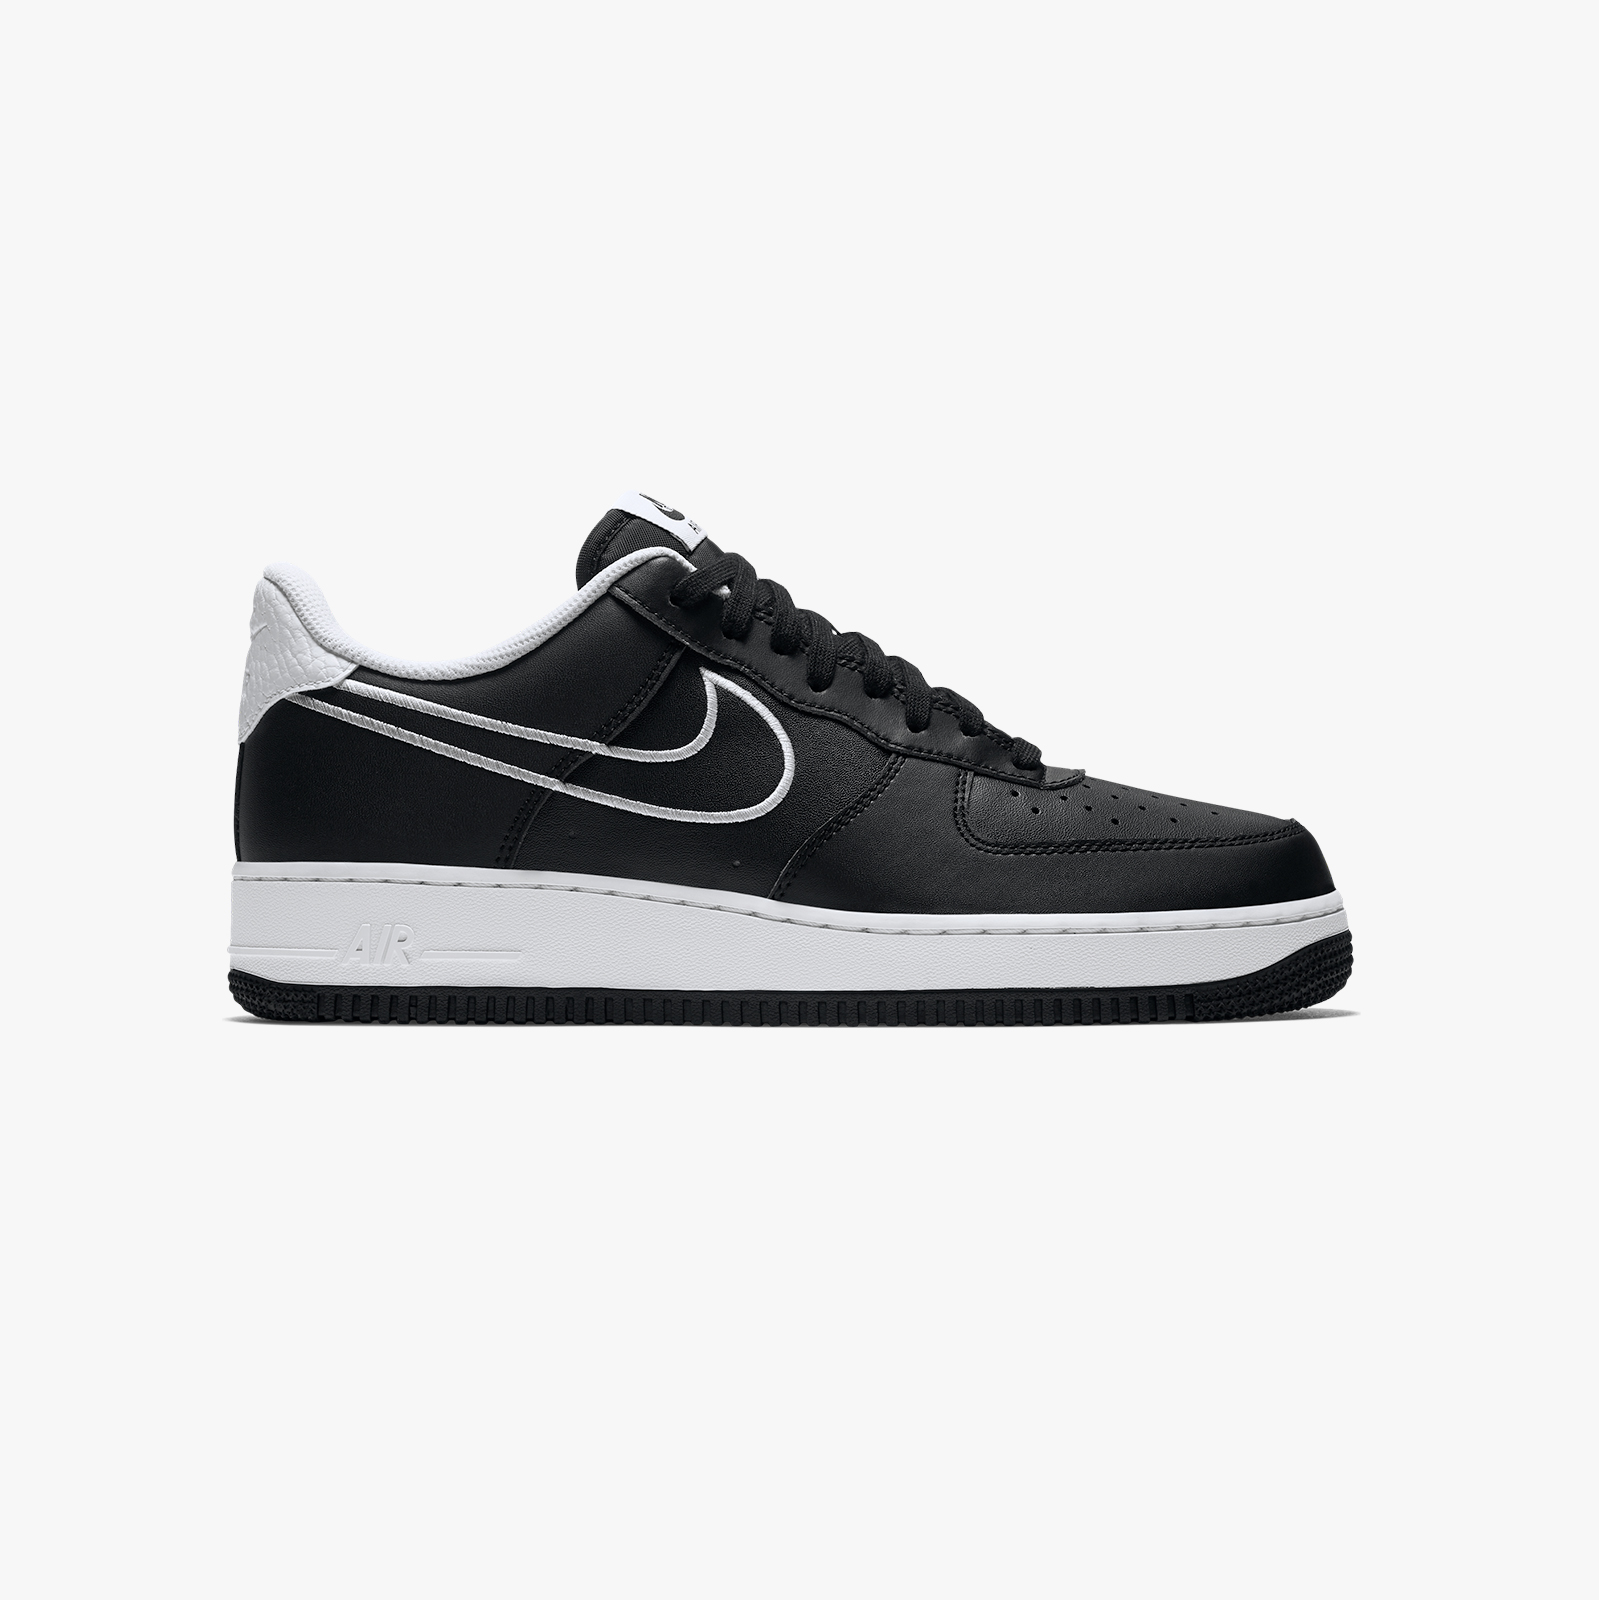 Nike Air Force 1 07 Leather - Aj7280